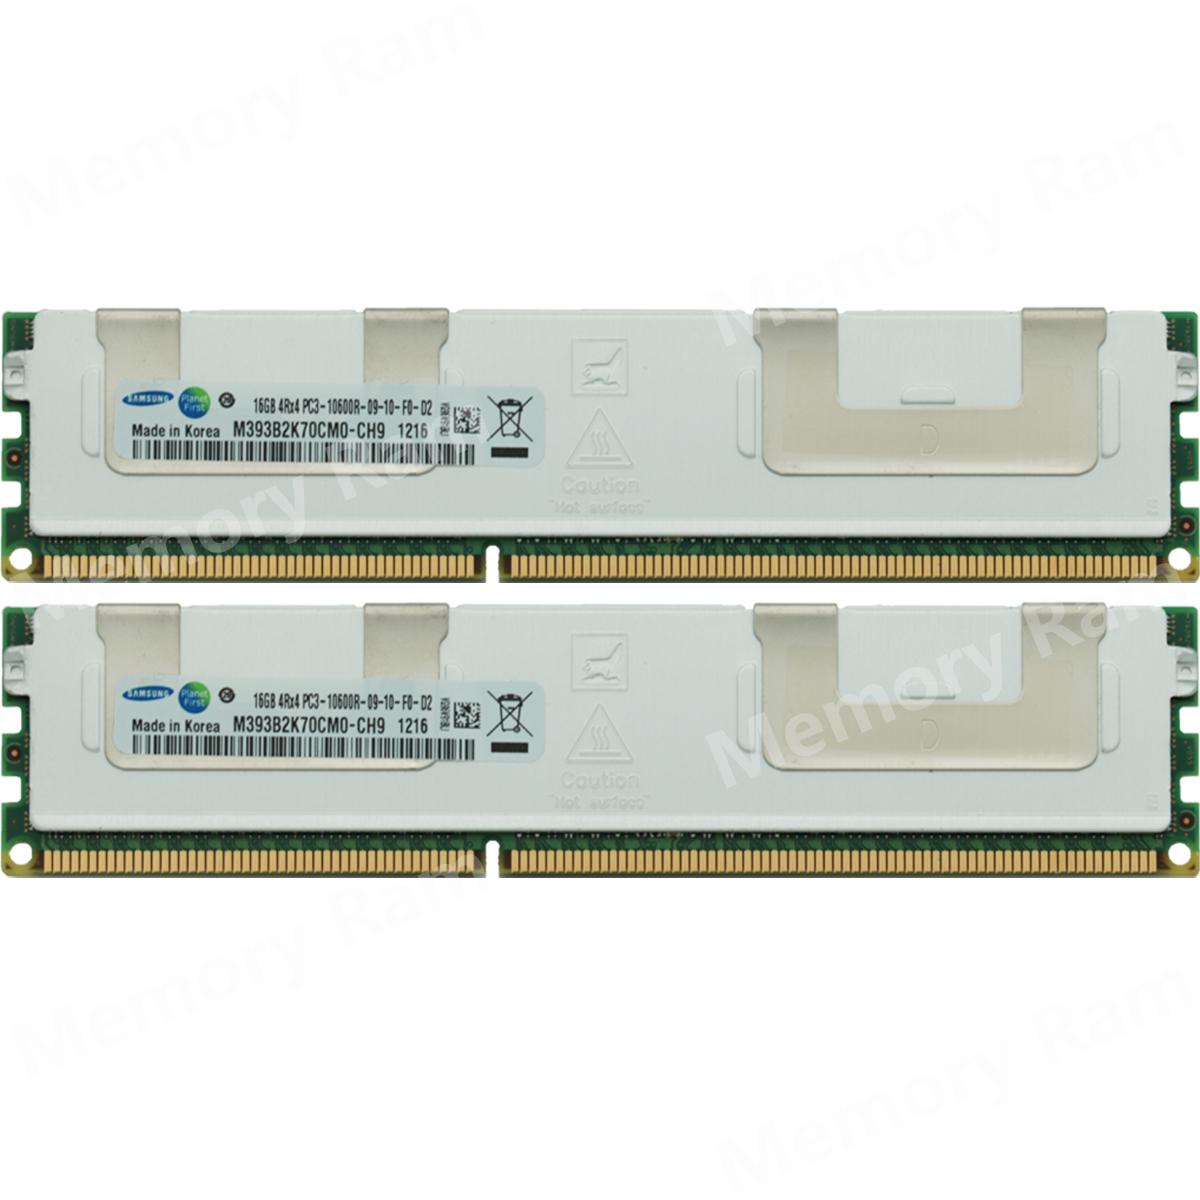 Samsung 64GB PC3-10600R 4RX4 DDR3-1333Mhz 240Pin REG Server Memory Ram 4X16GB